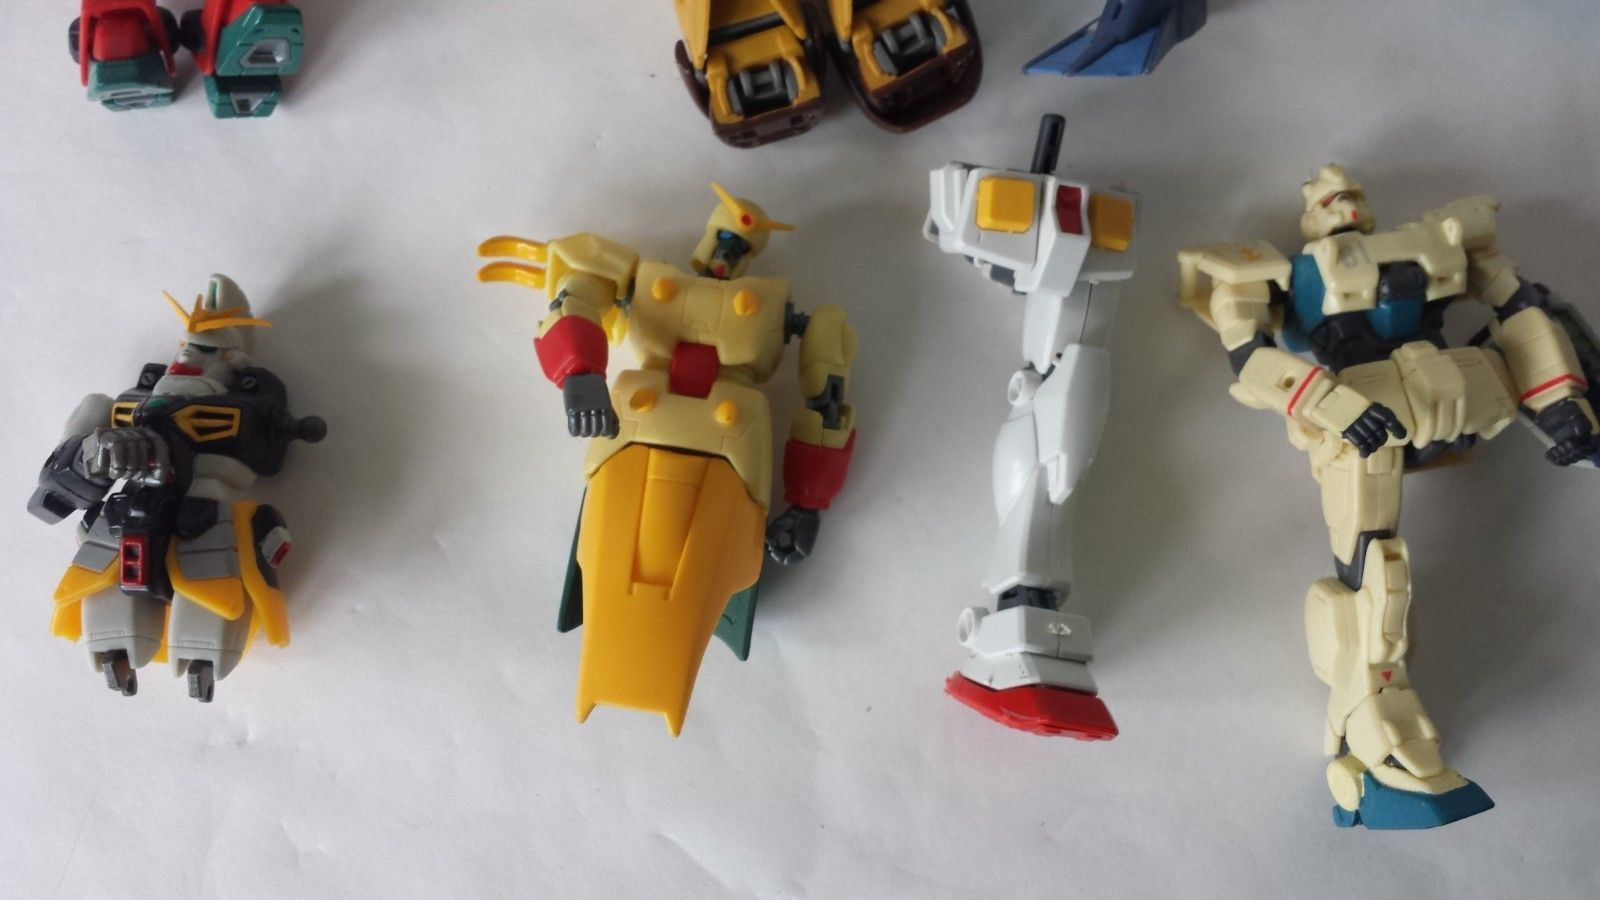 7 Misc Broken Plastic Figure Parts Gundam Transformer Style Soldiers Parts Only